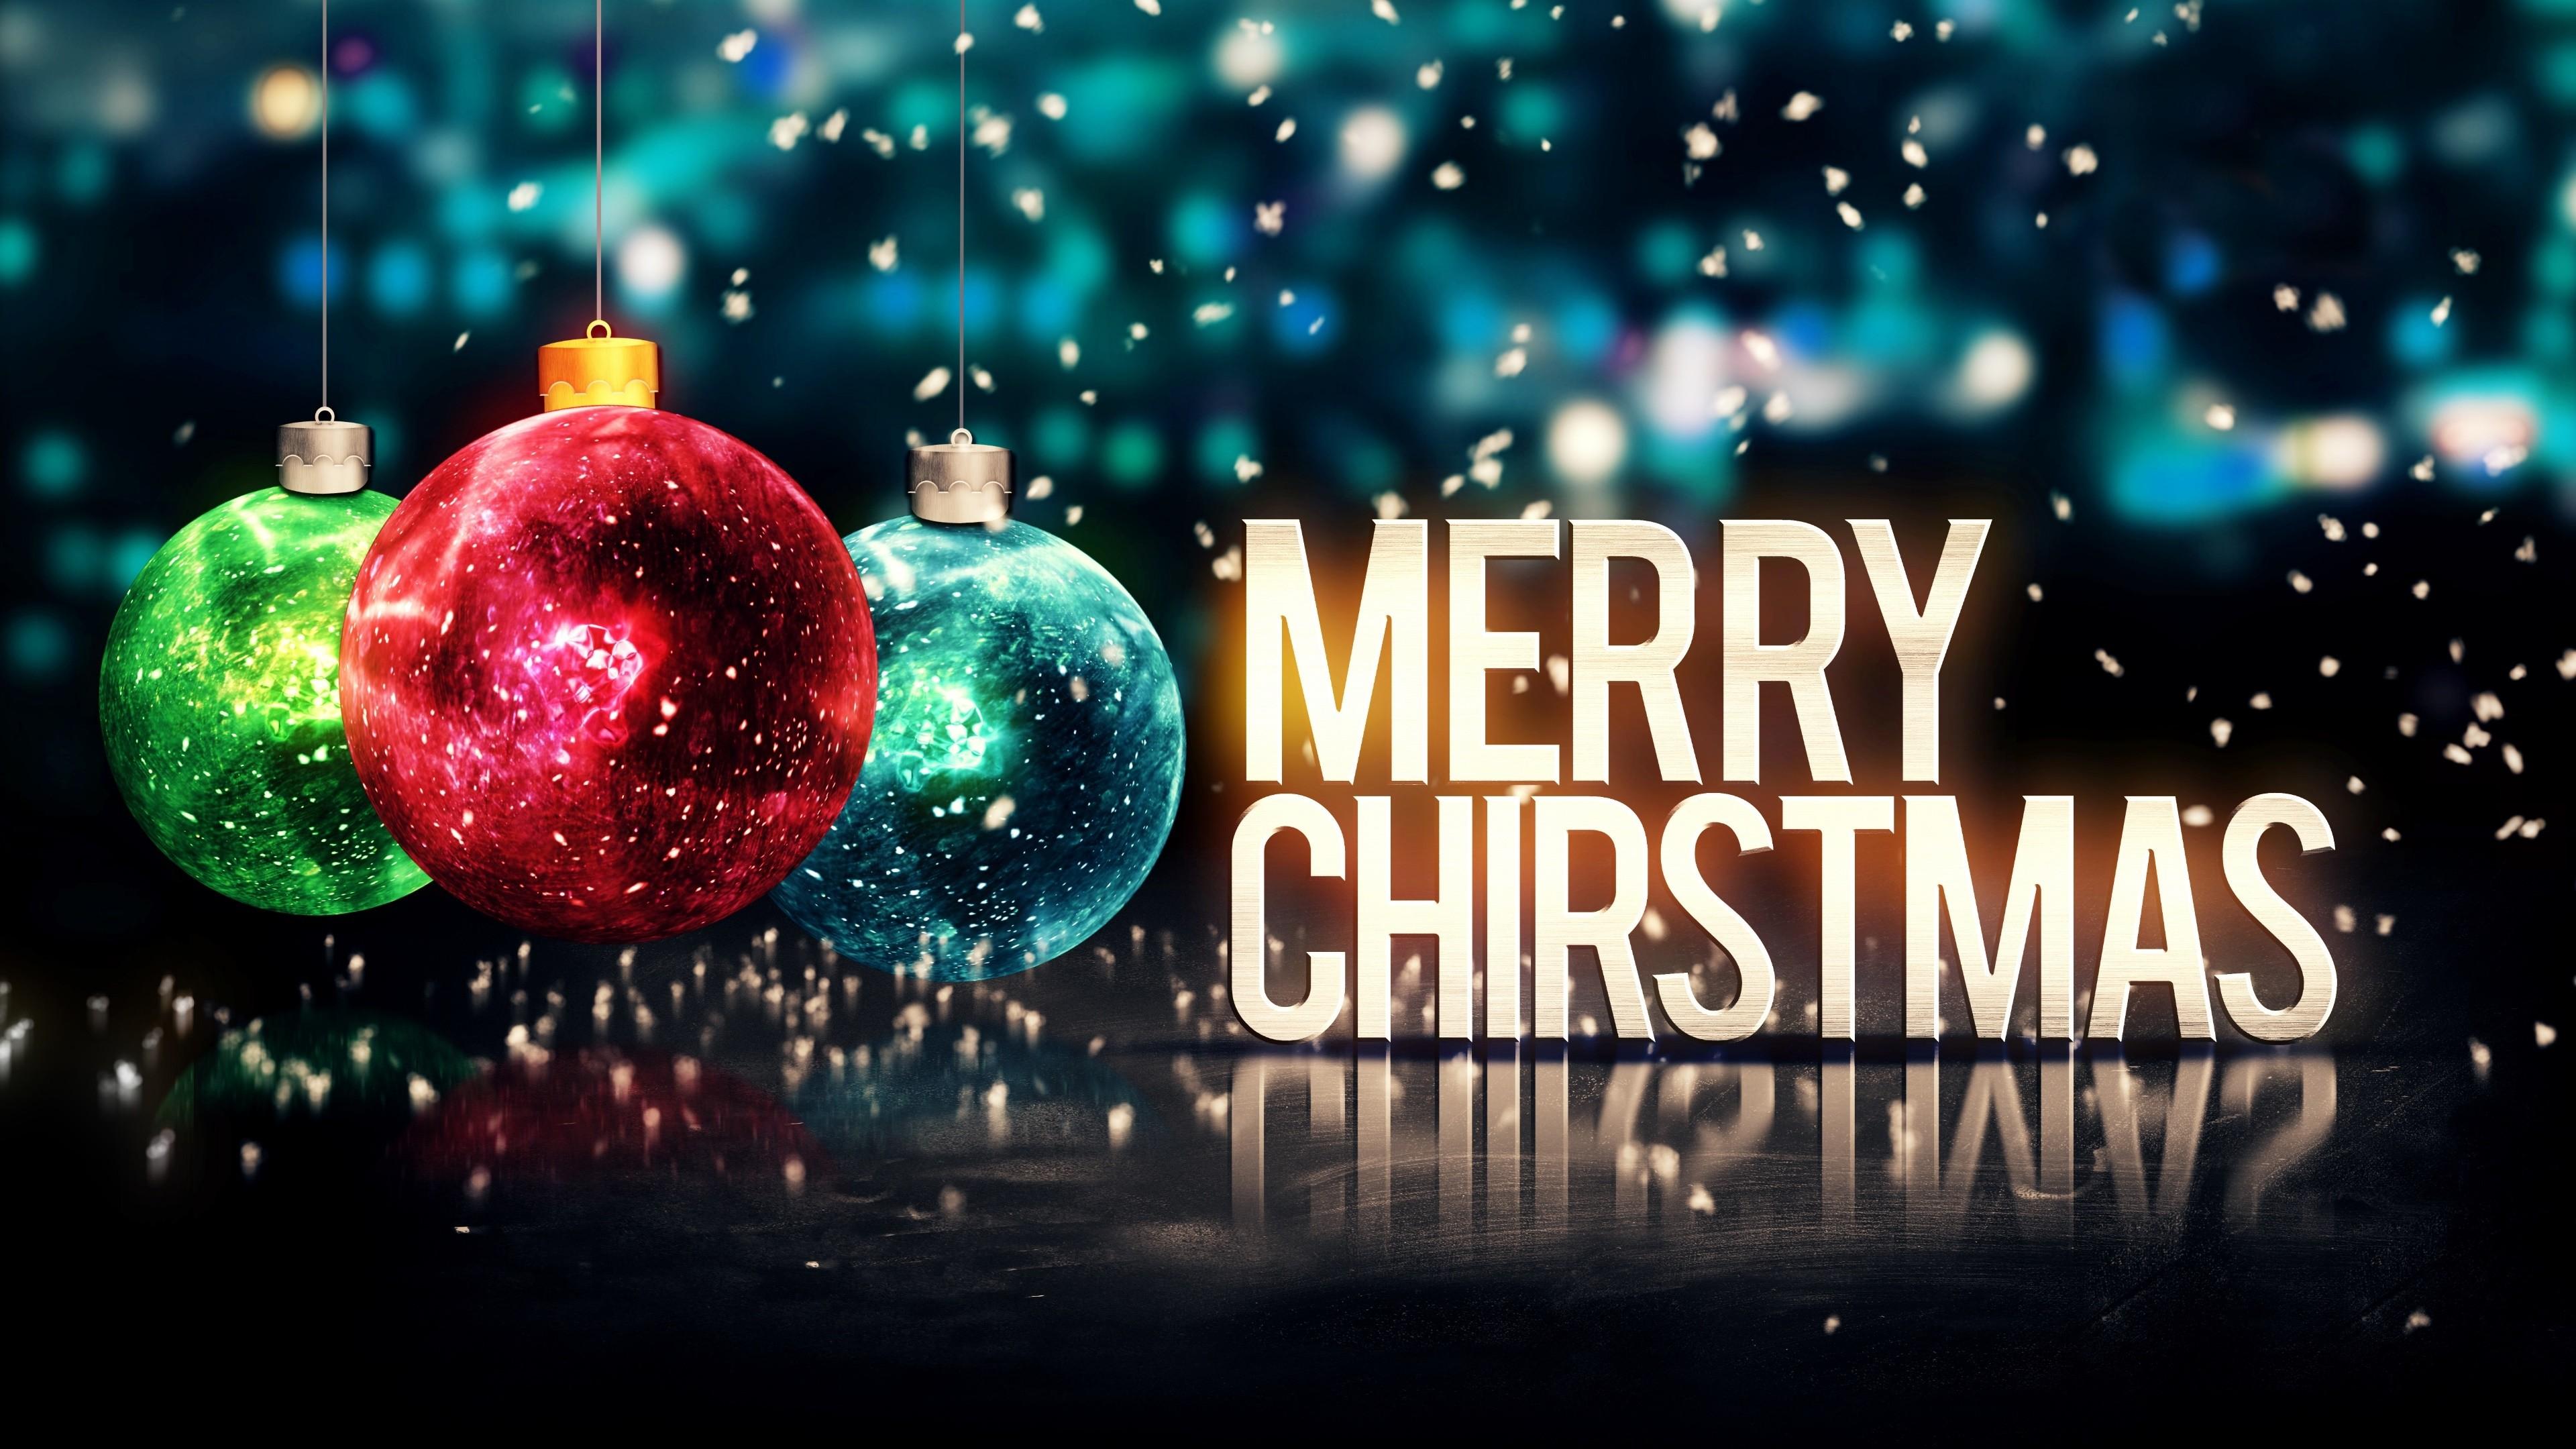 Merry Christmas 4K UHD Wallpaper 3840×2160